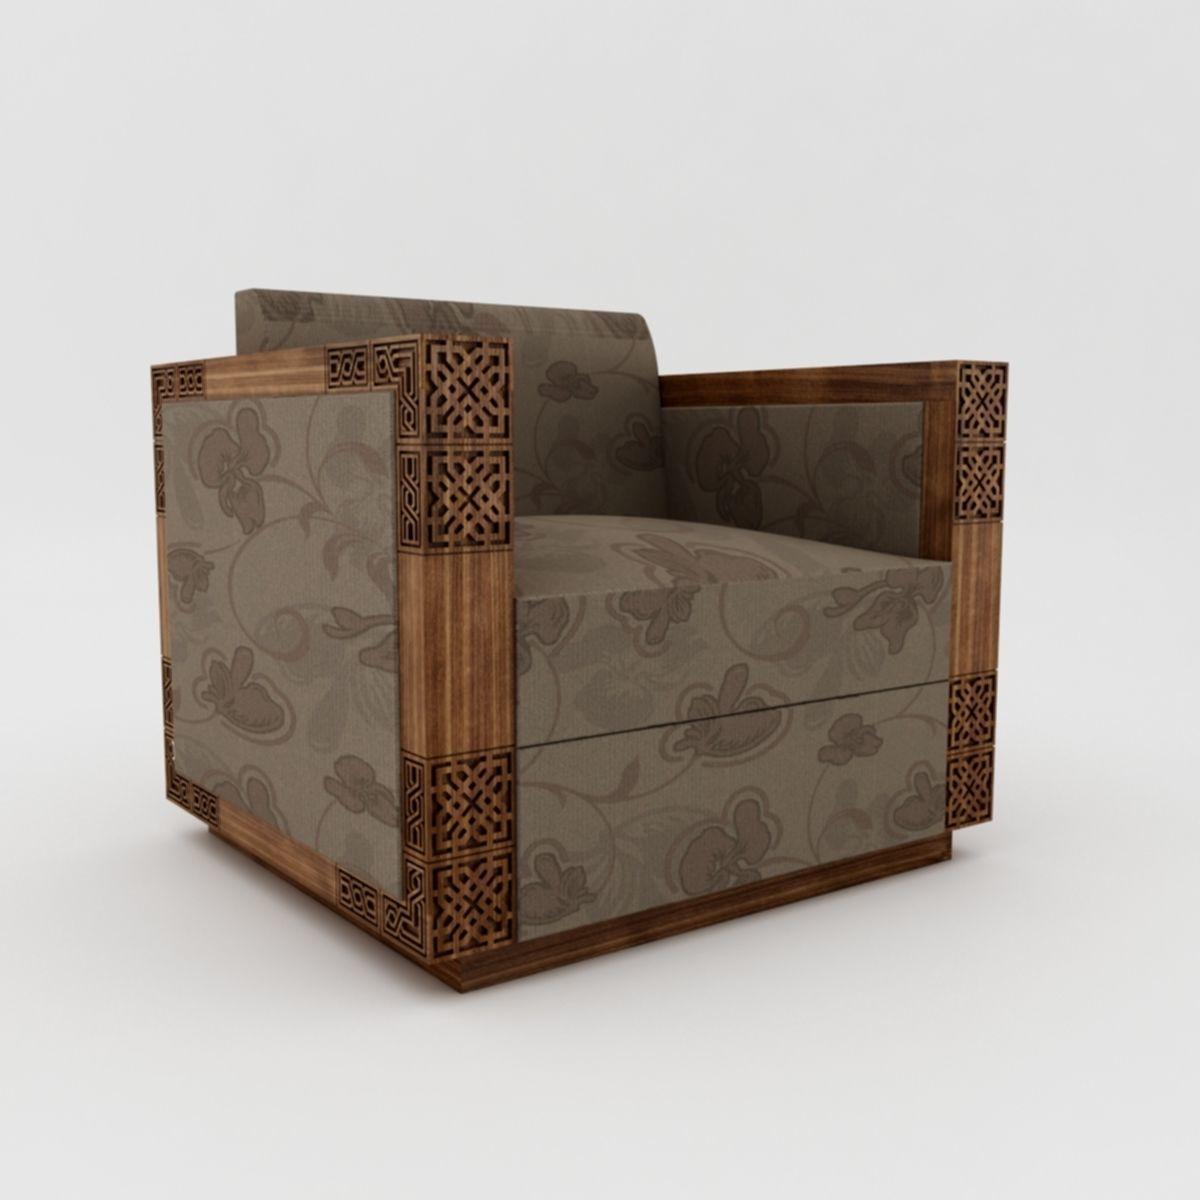 Single Seater Sofa Model Low Poly Max Obj Mtl S 9